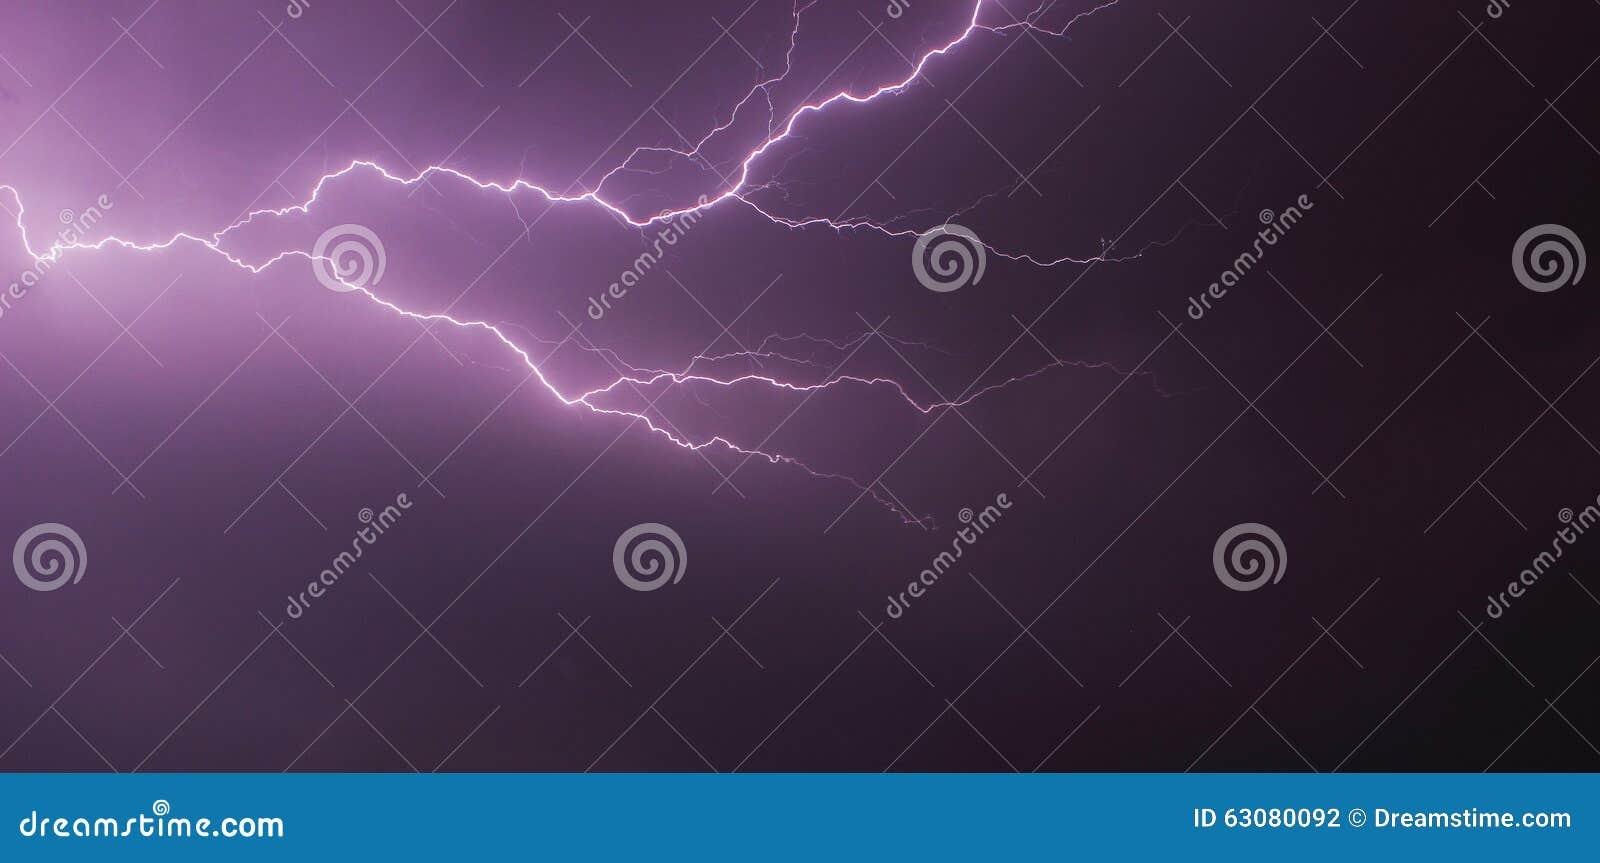 Very large lightning